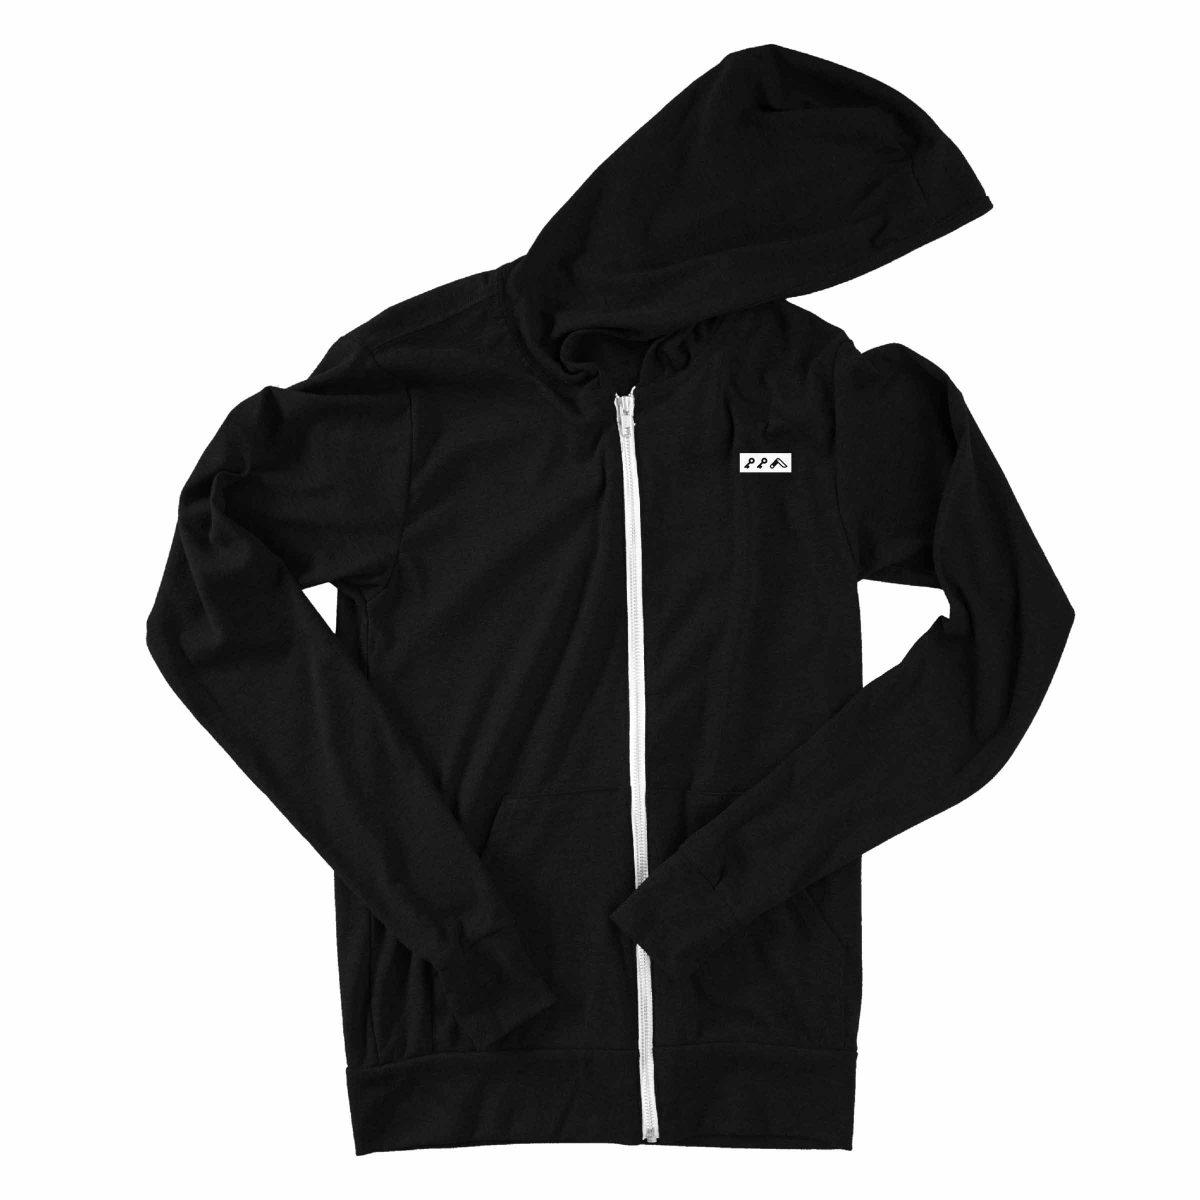 kikicutt icon lightweight unisex zip hoodies by kikicutt sweatshirt store